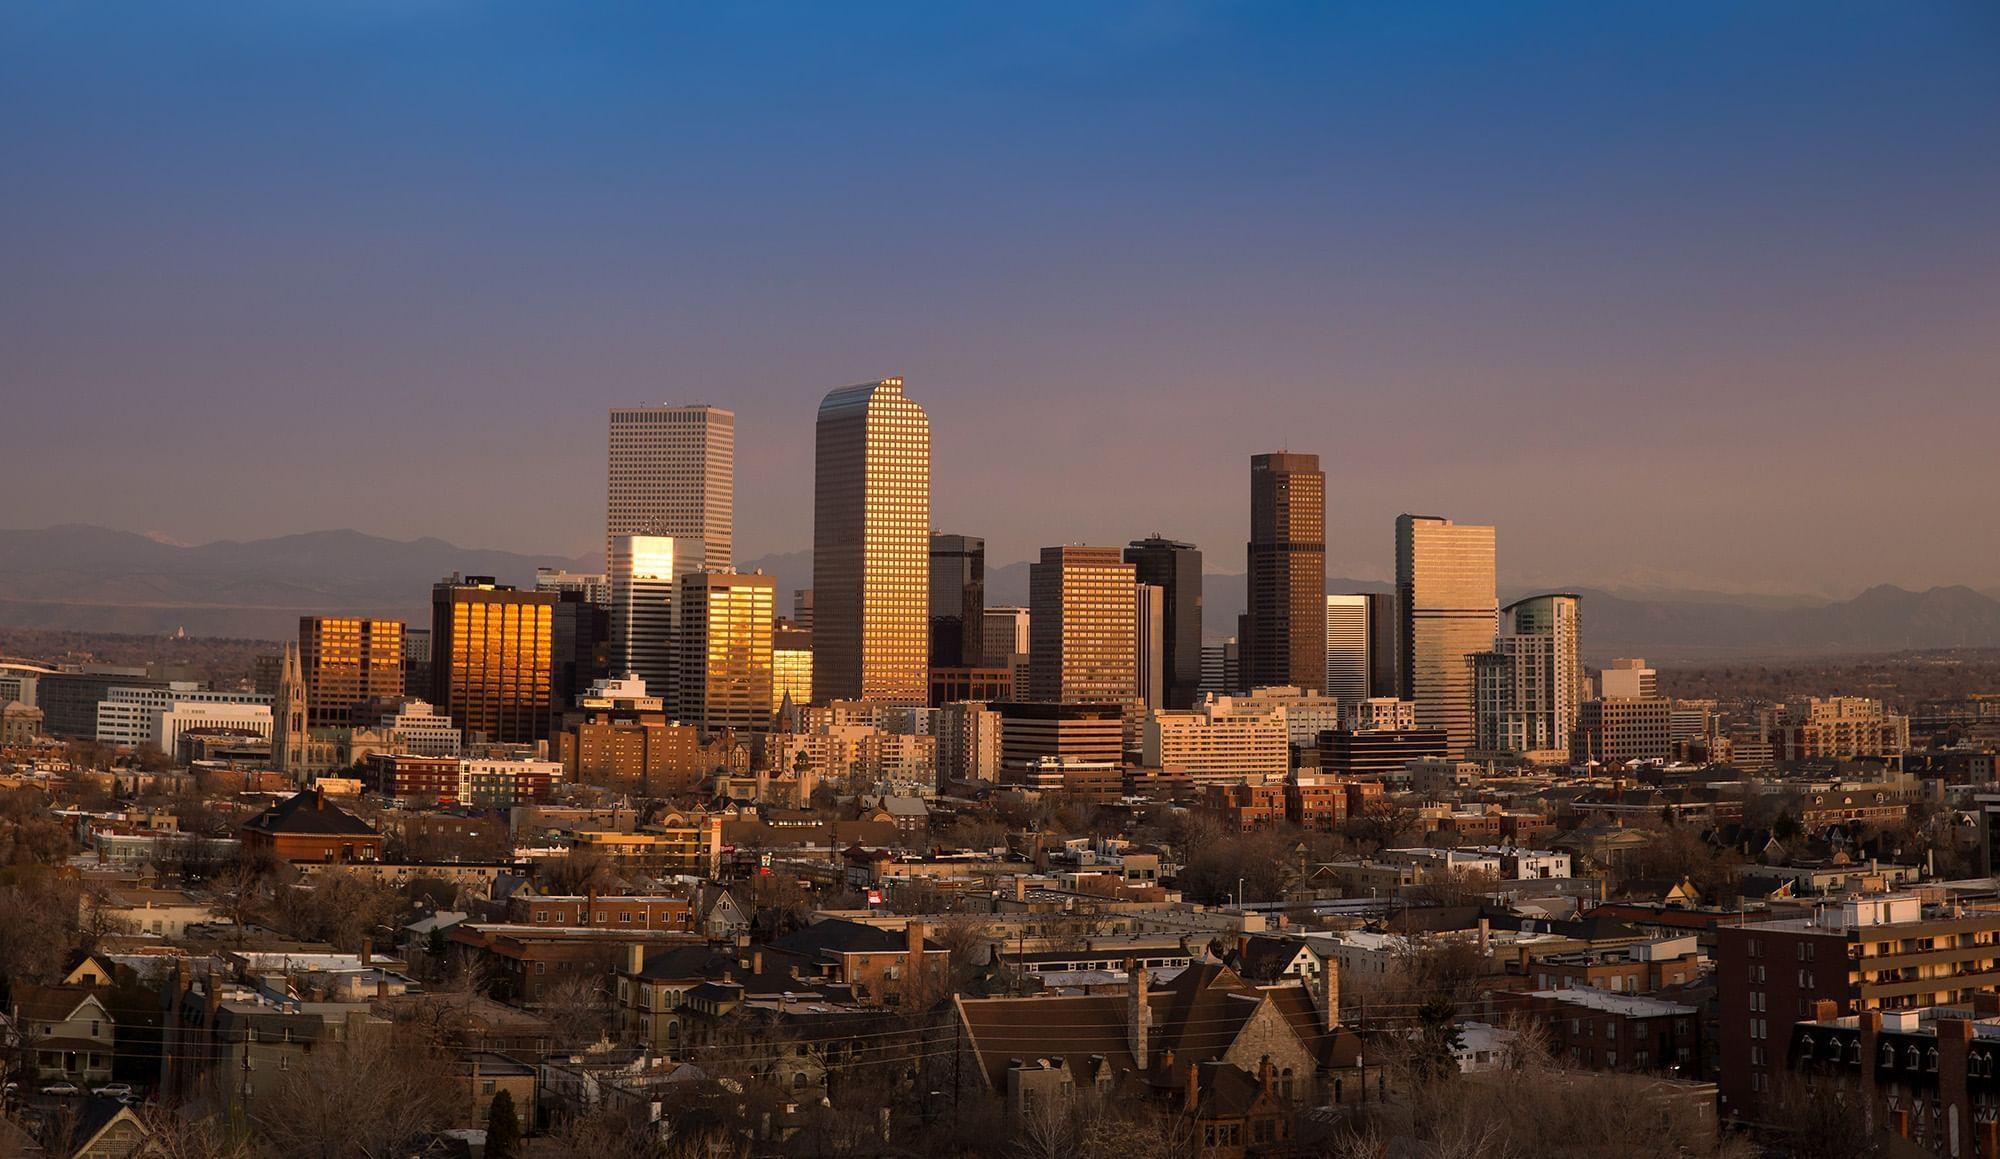 Denver CitySkyline with the hotel